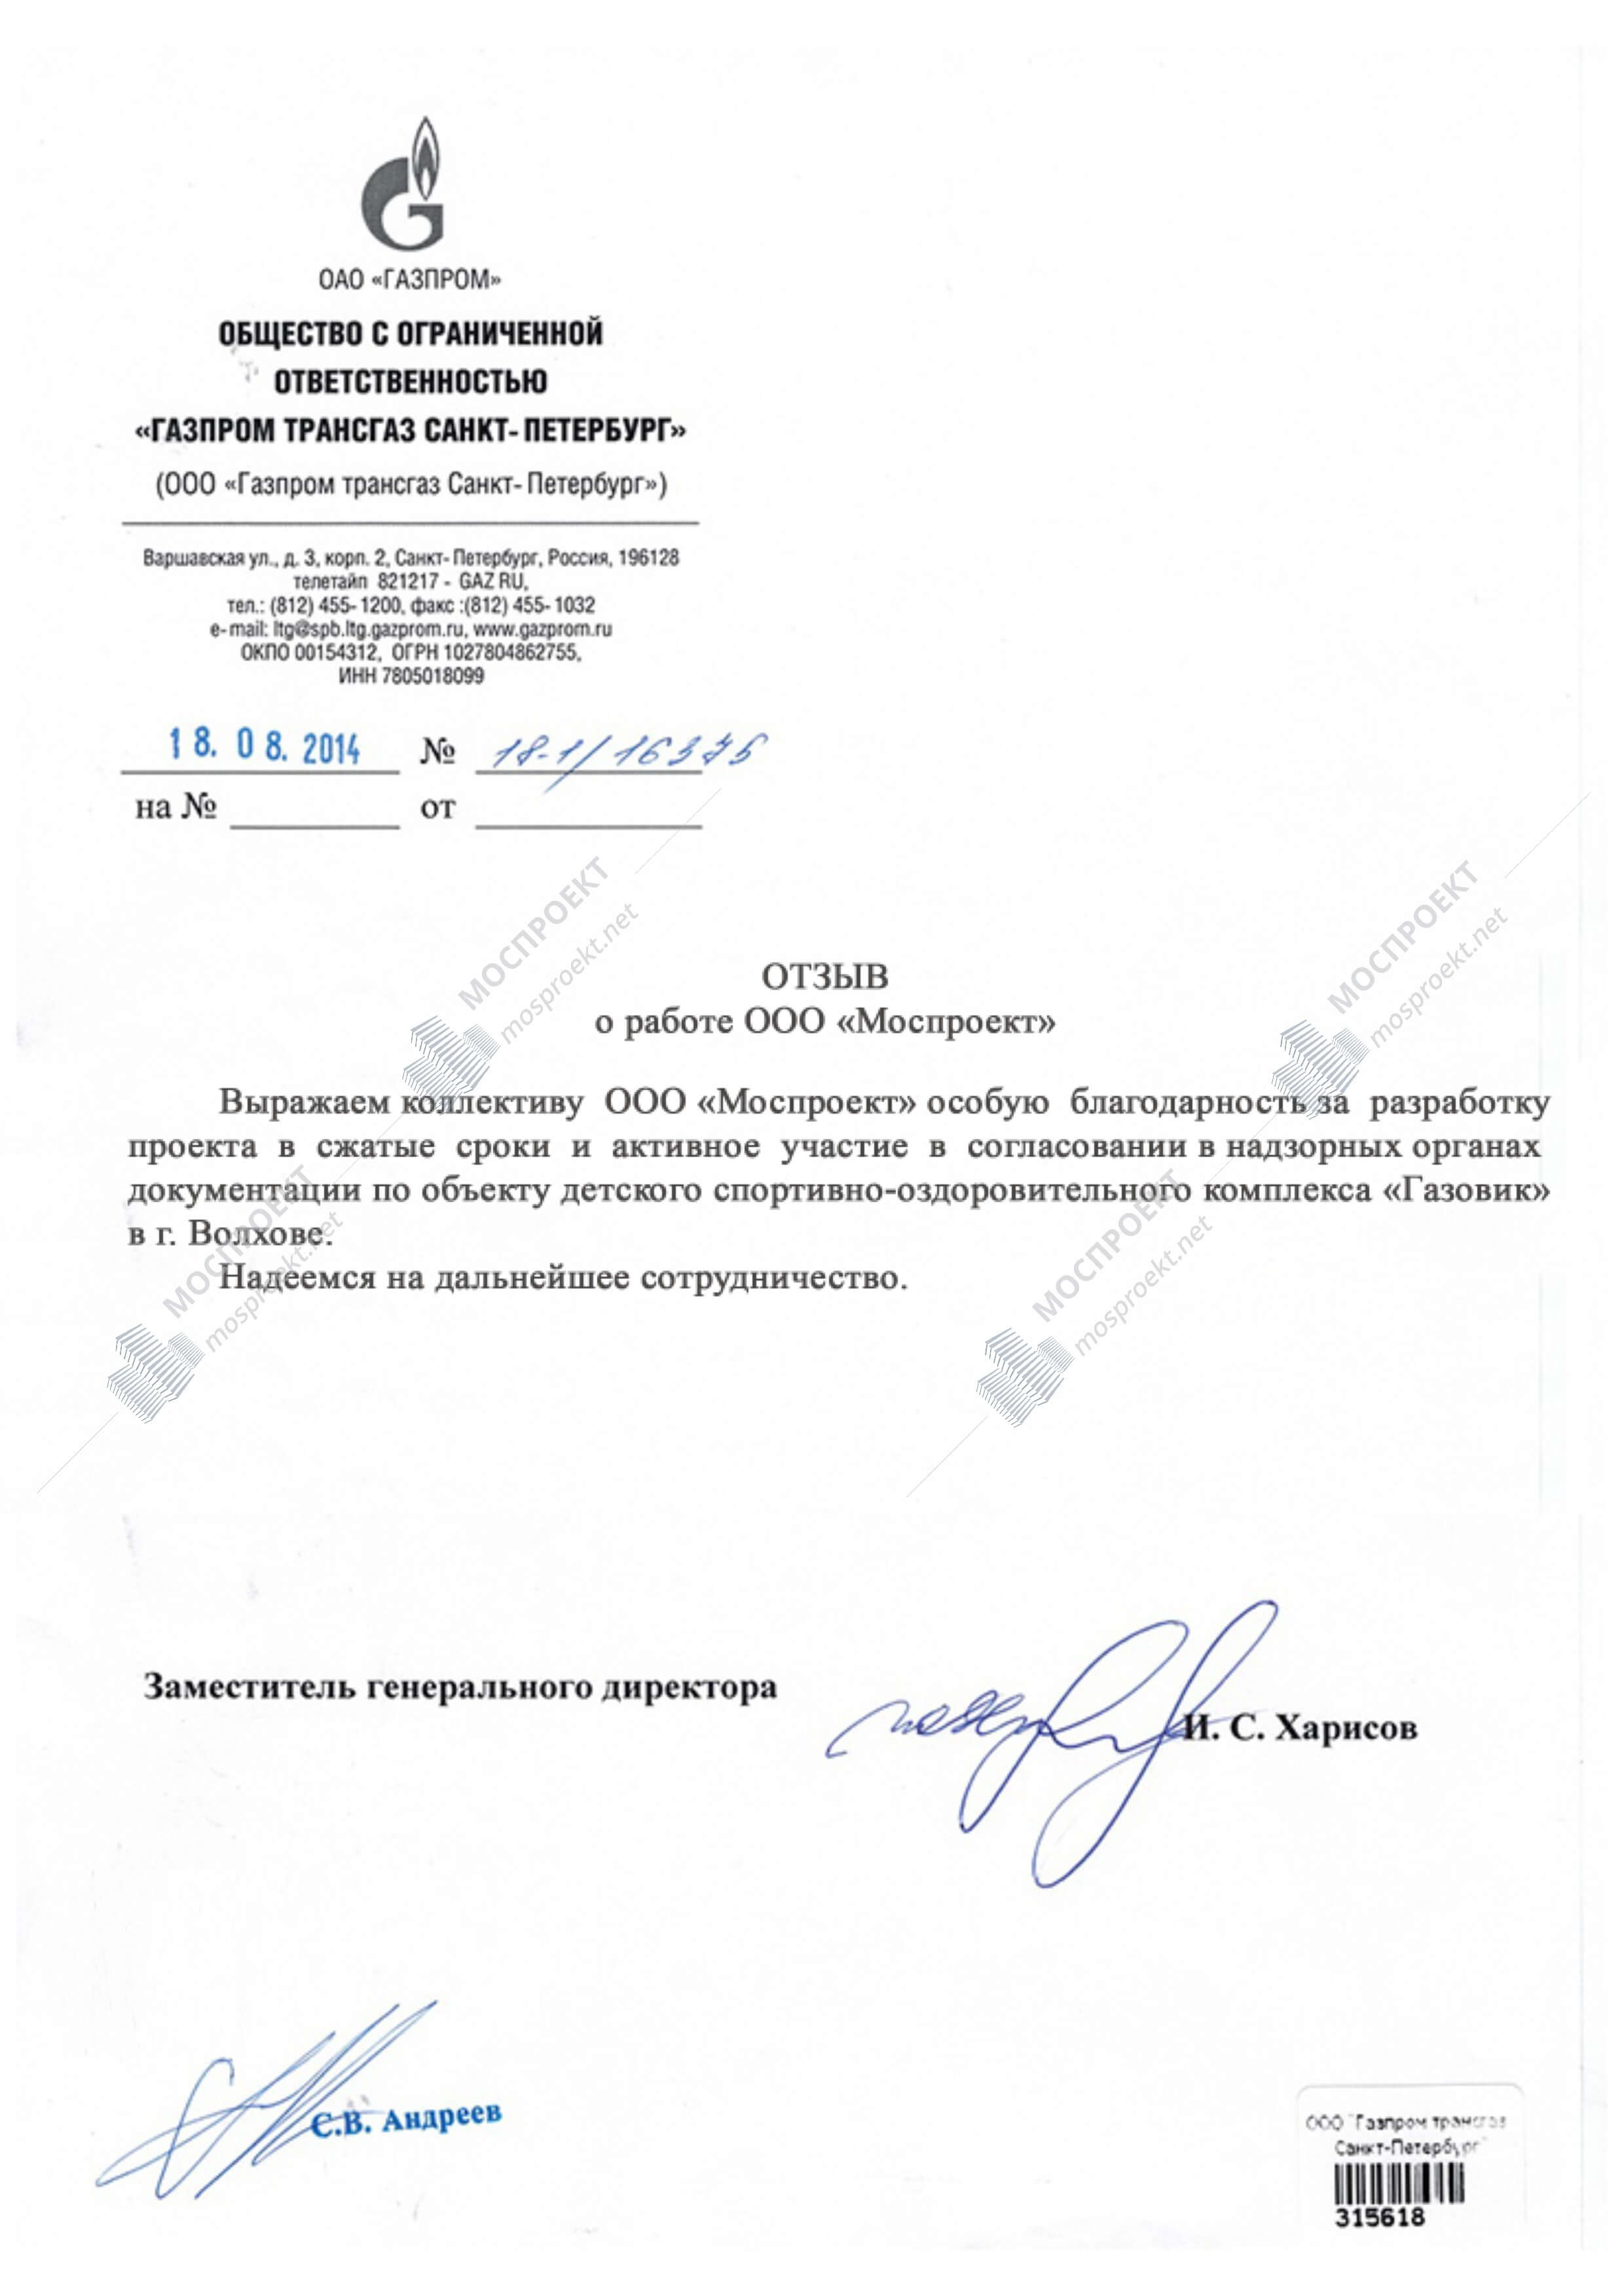 письмо Газпром Транснефть